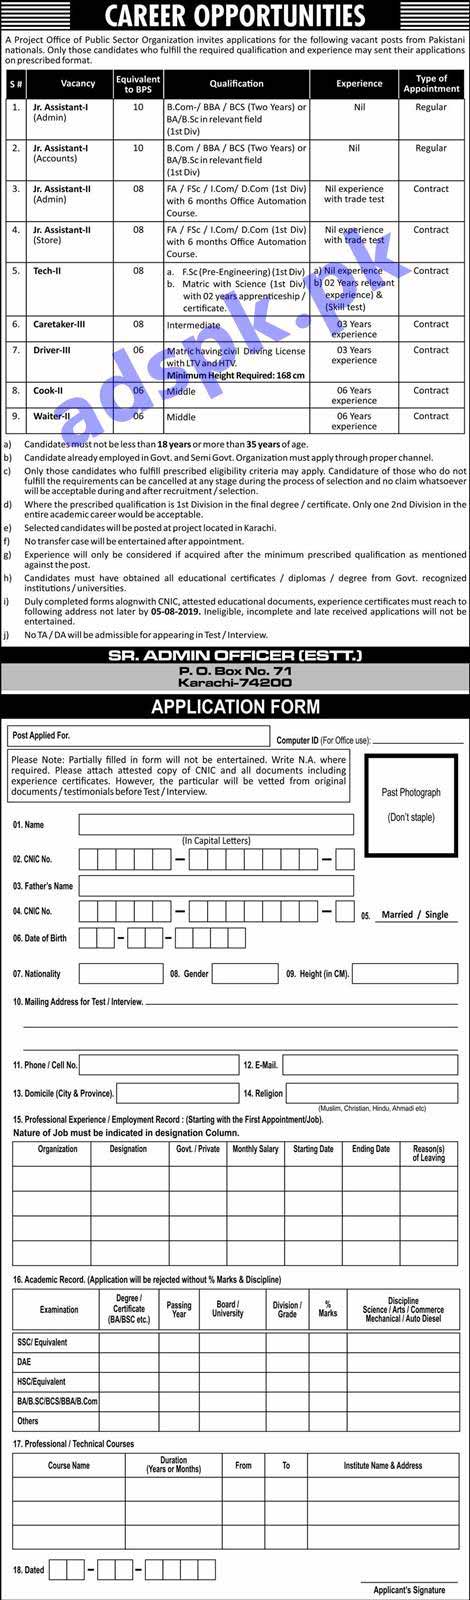 Public Sector Organization PO Box 71 Karachi Jobs 2019 for Junior Assistant Tech Caretaker Driver Cook Waiter Jobs Application Form Deadline 05-08-2019 Apply Now